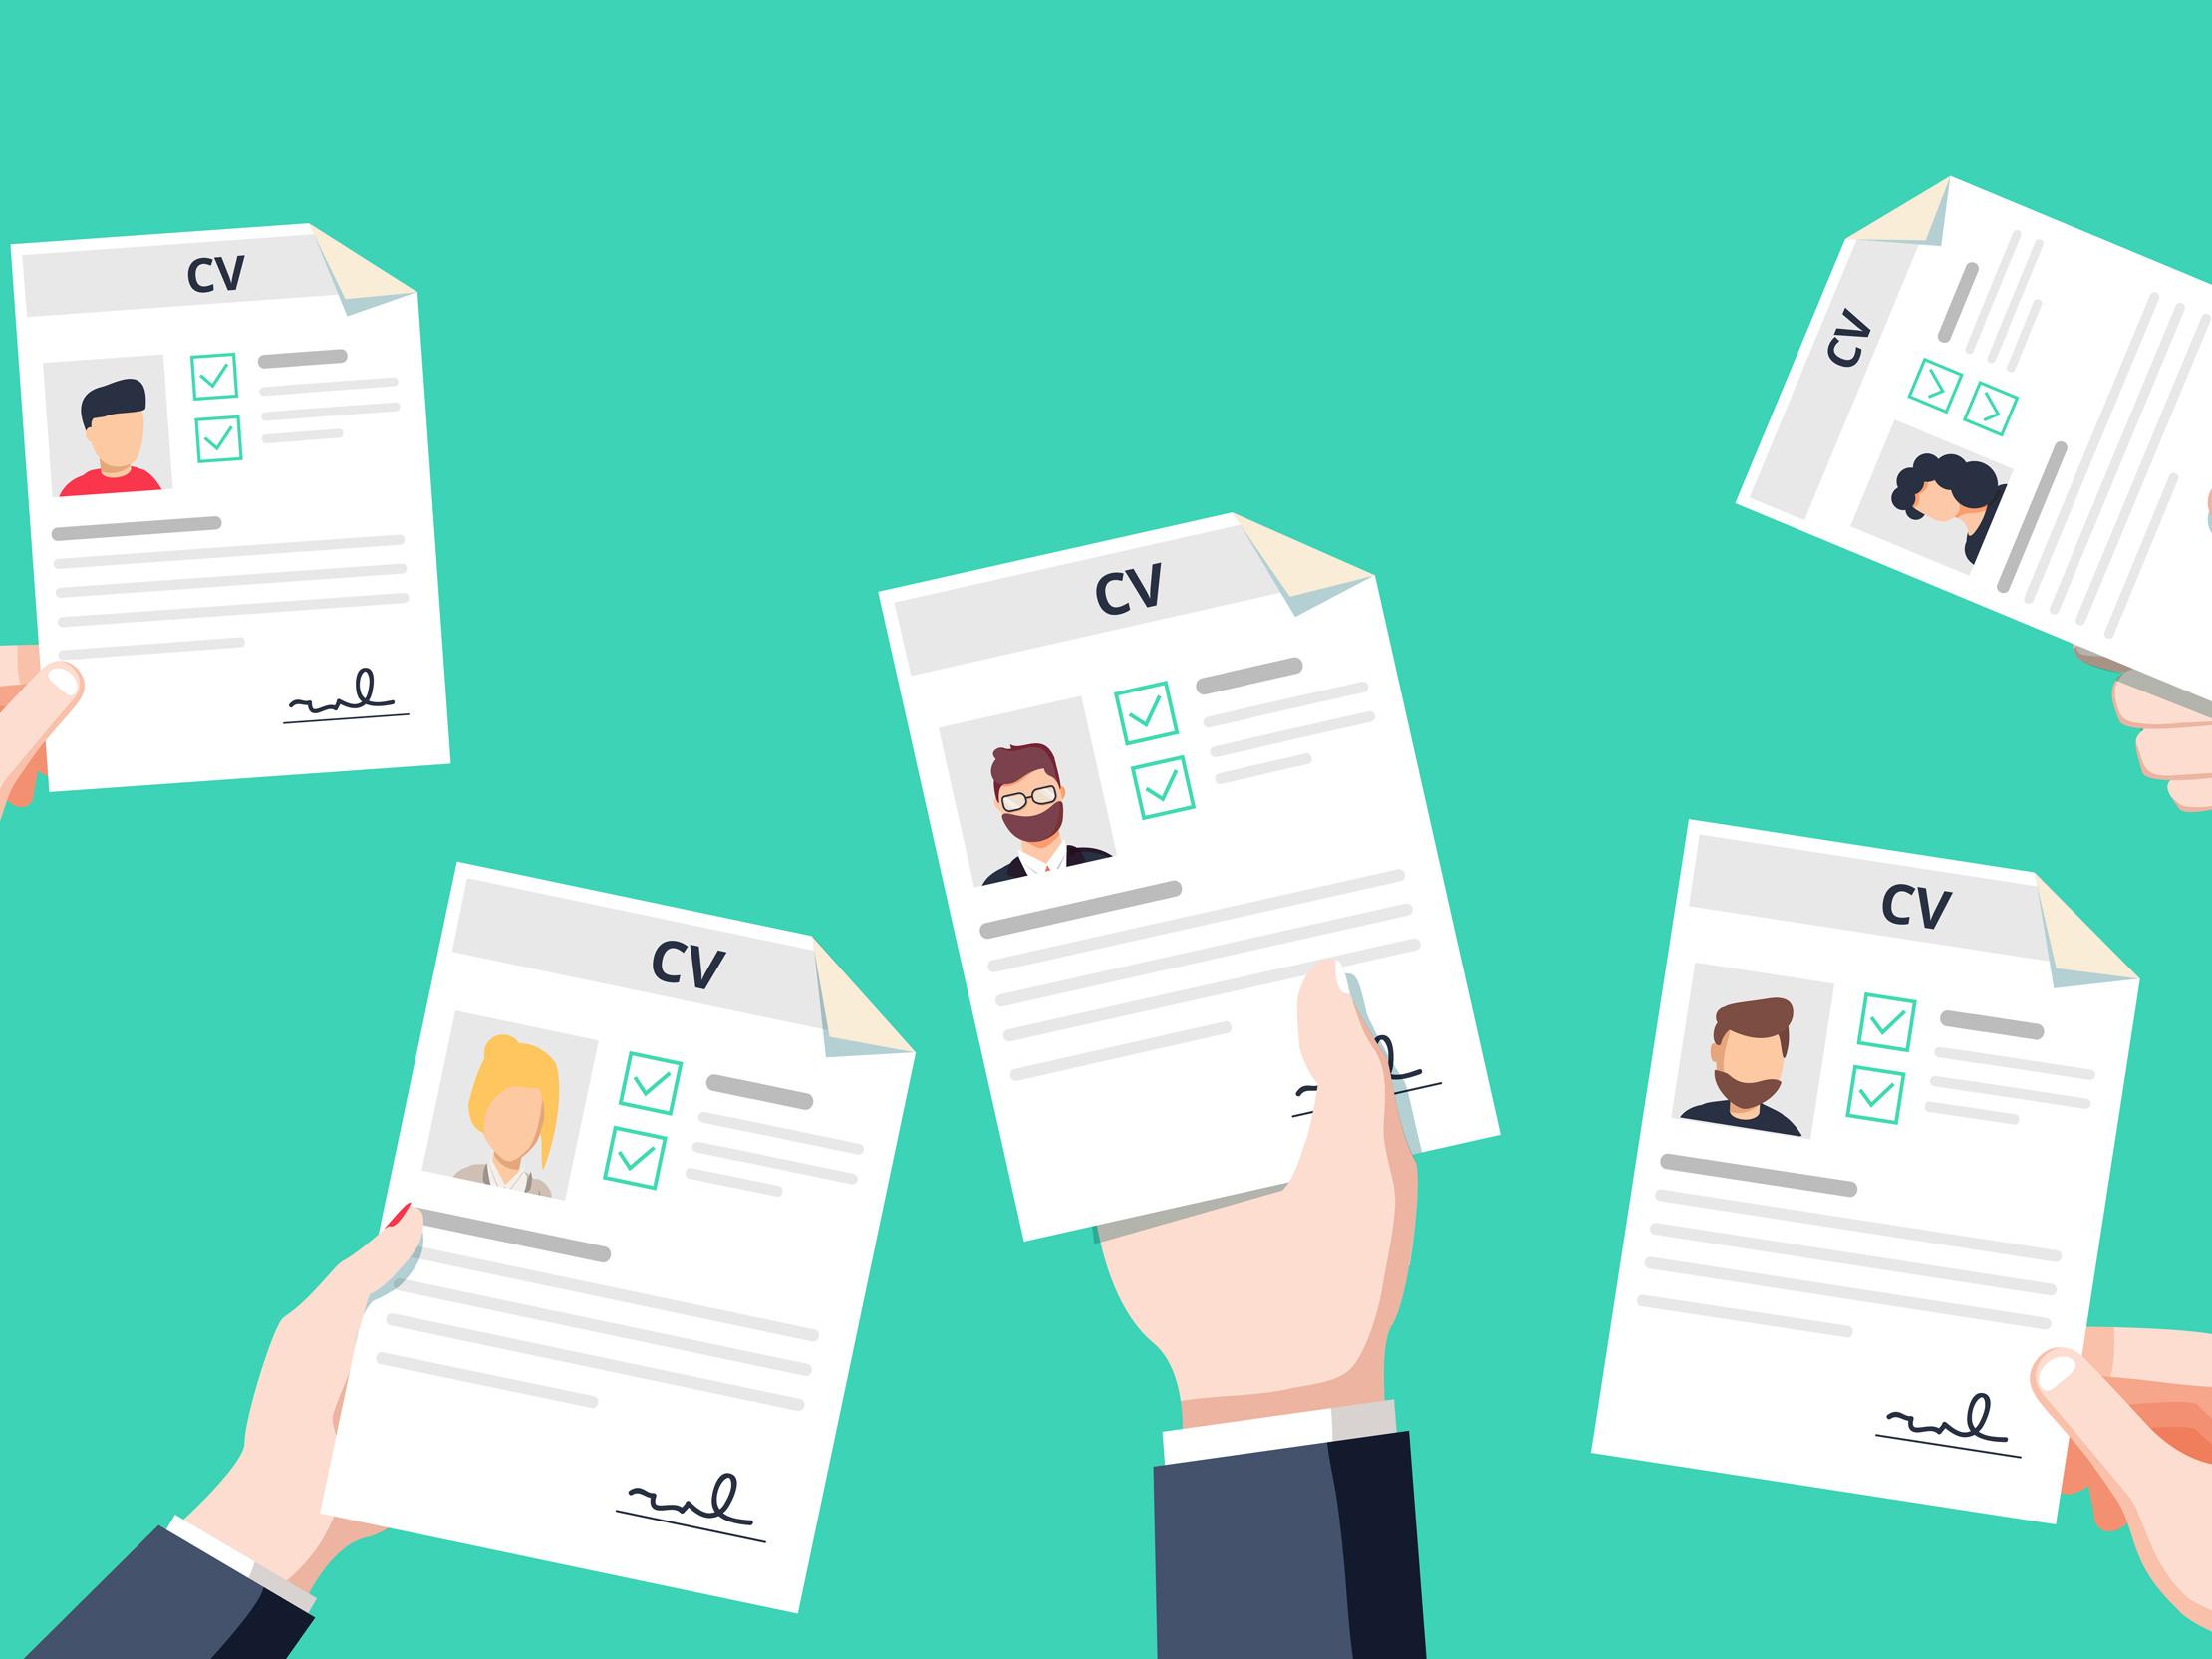 Gode råd til det gode CV